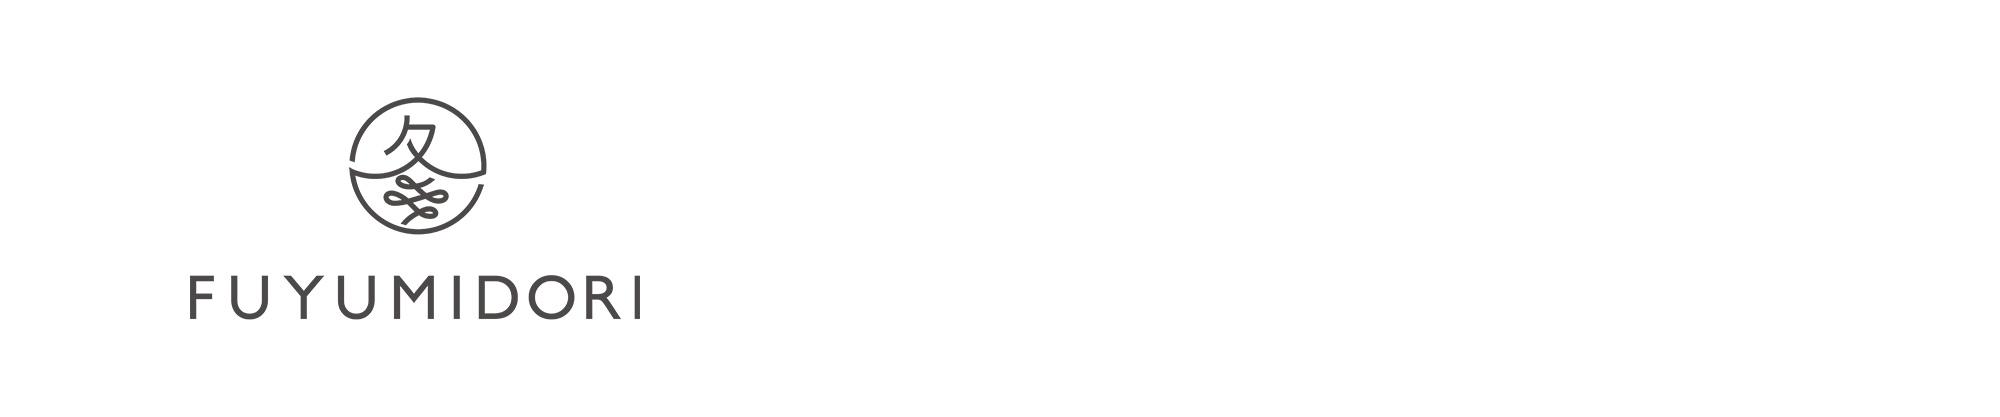 huyumidori logo